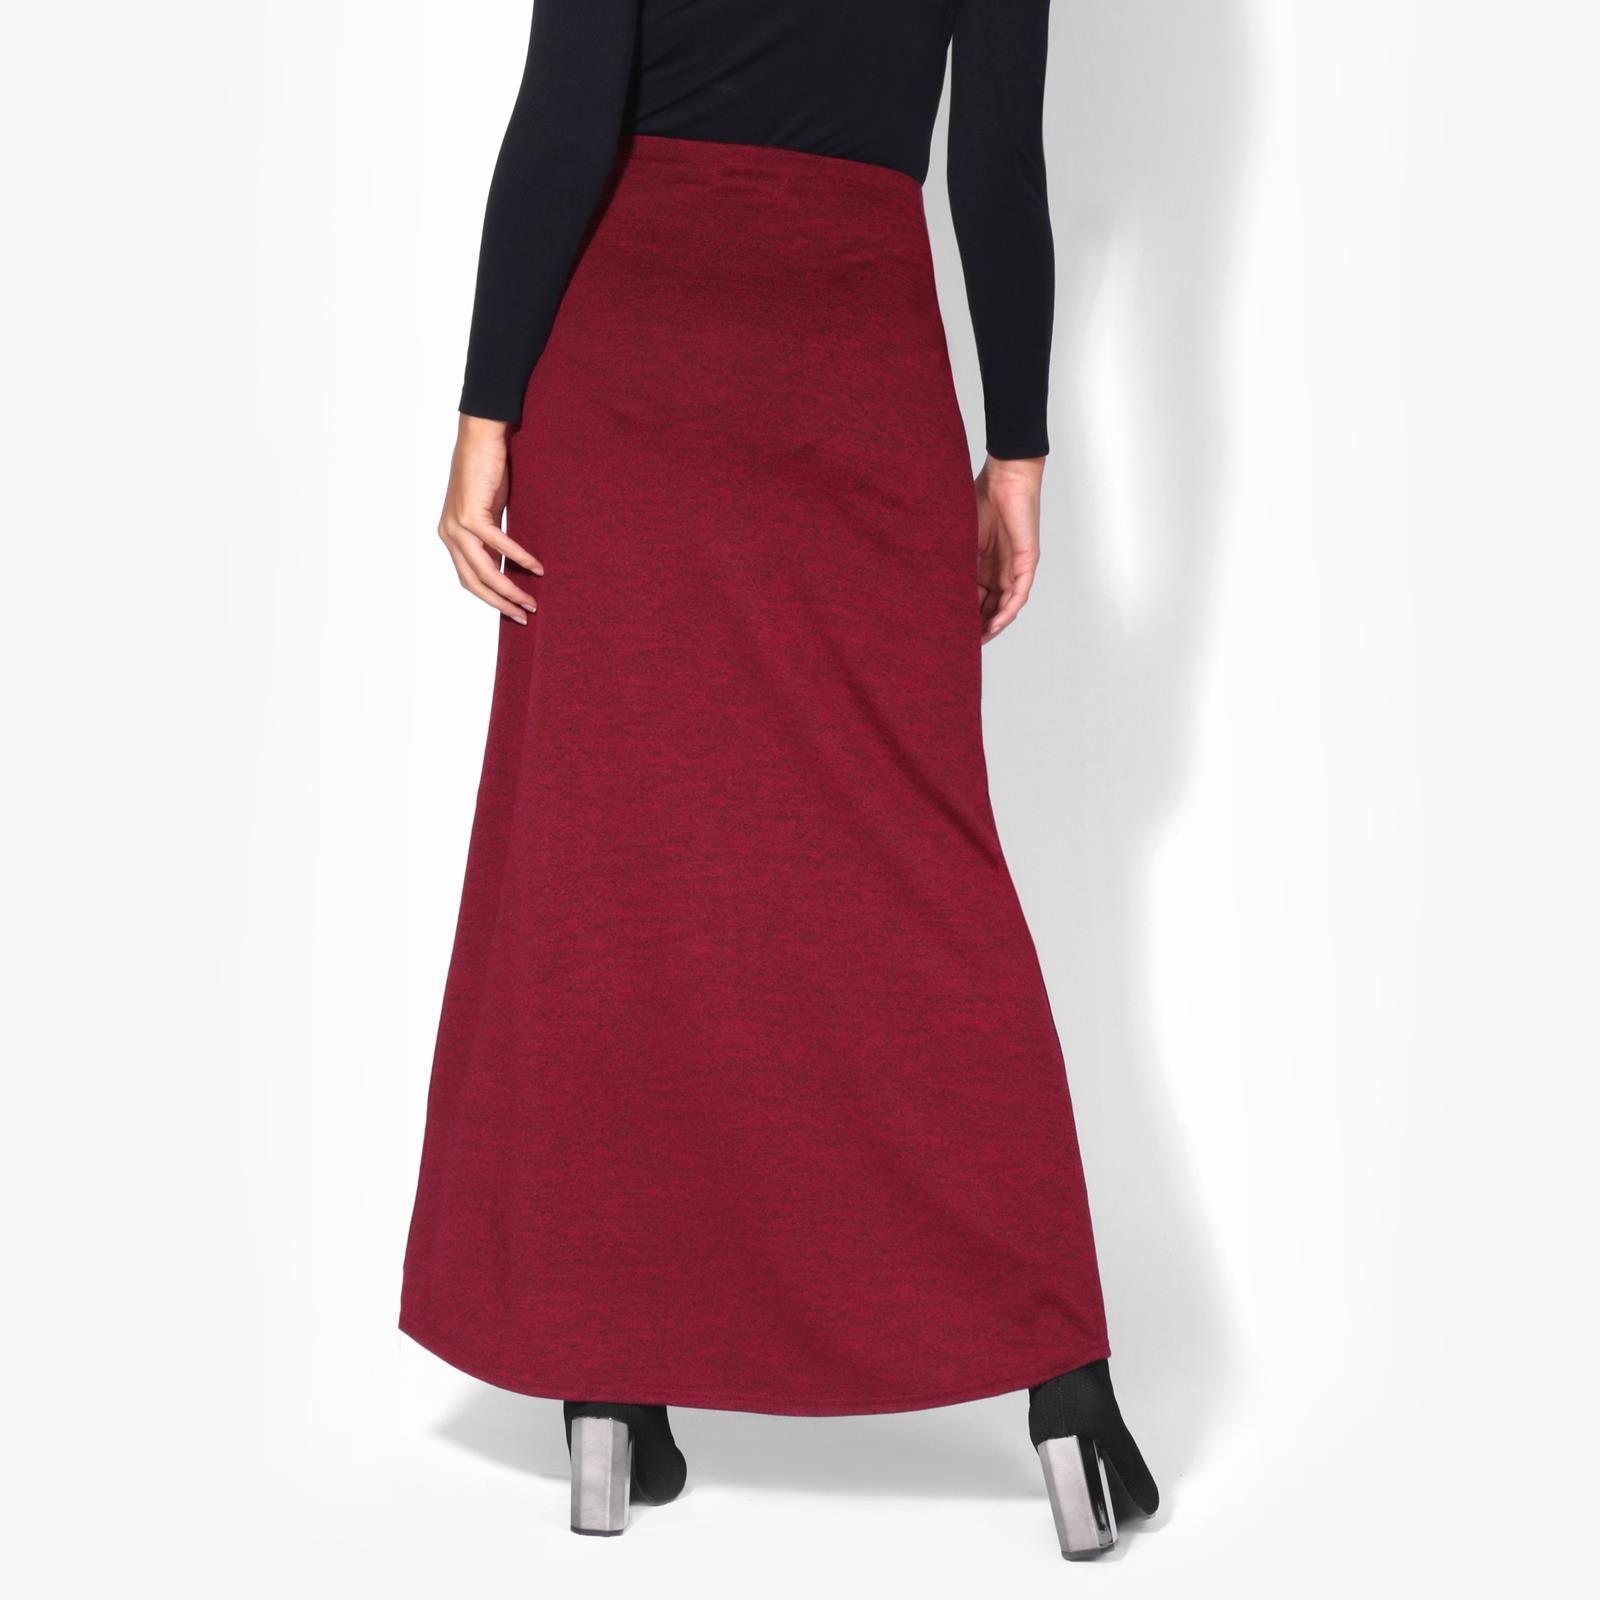 Womens-Ladies-Maxi-Skirt-High-Waist-A-Line-Long-Knit-Stretch-Bodycon-Casual-Boho thumbnail 19